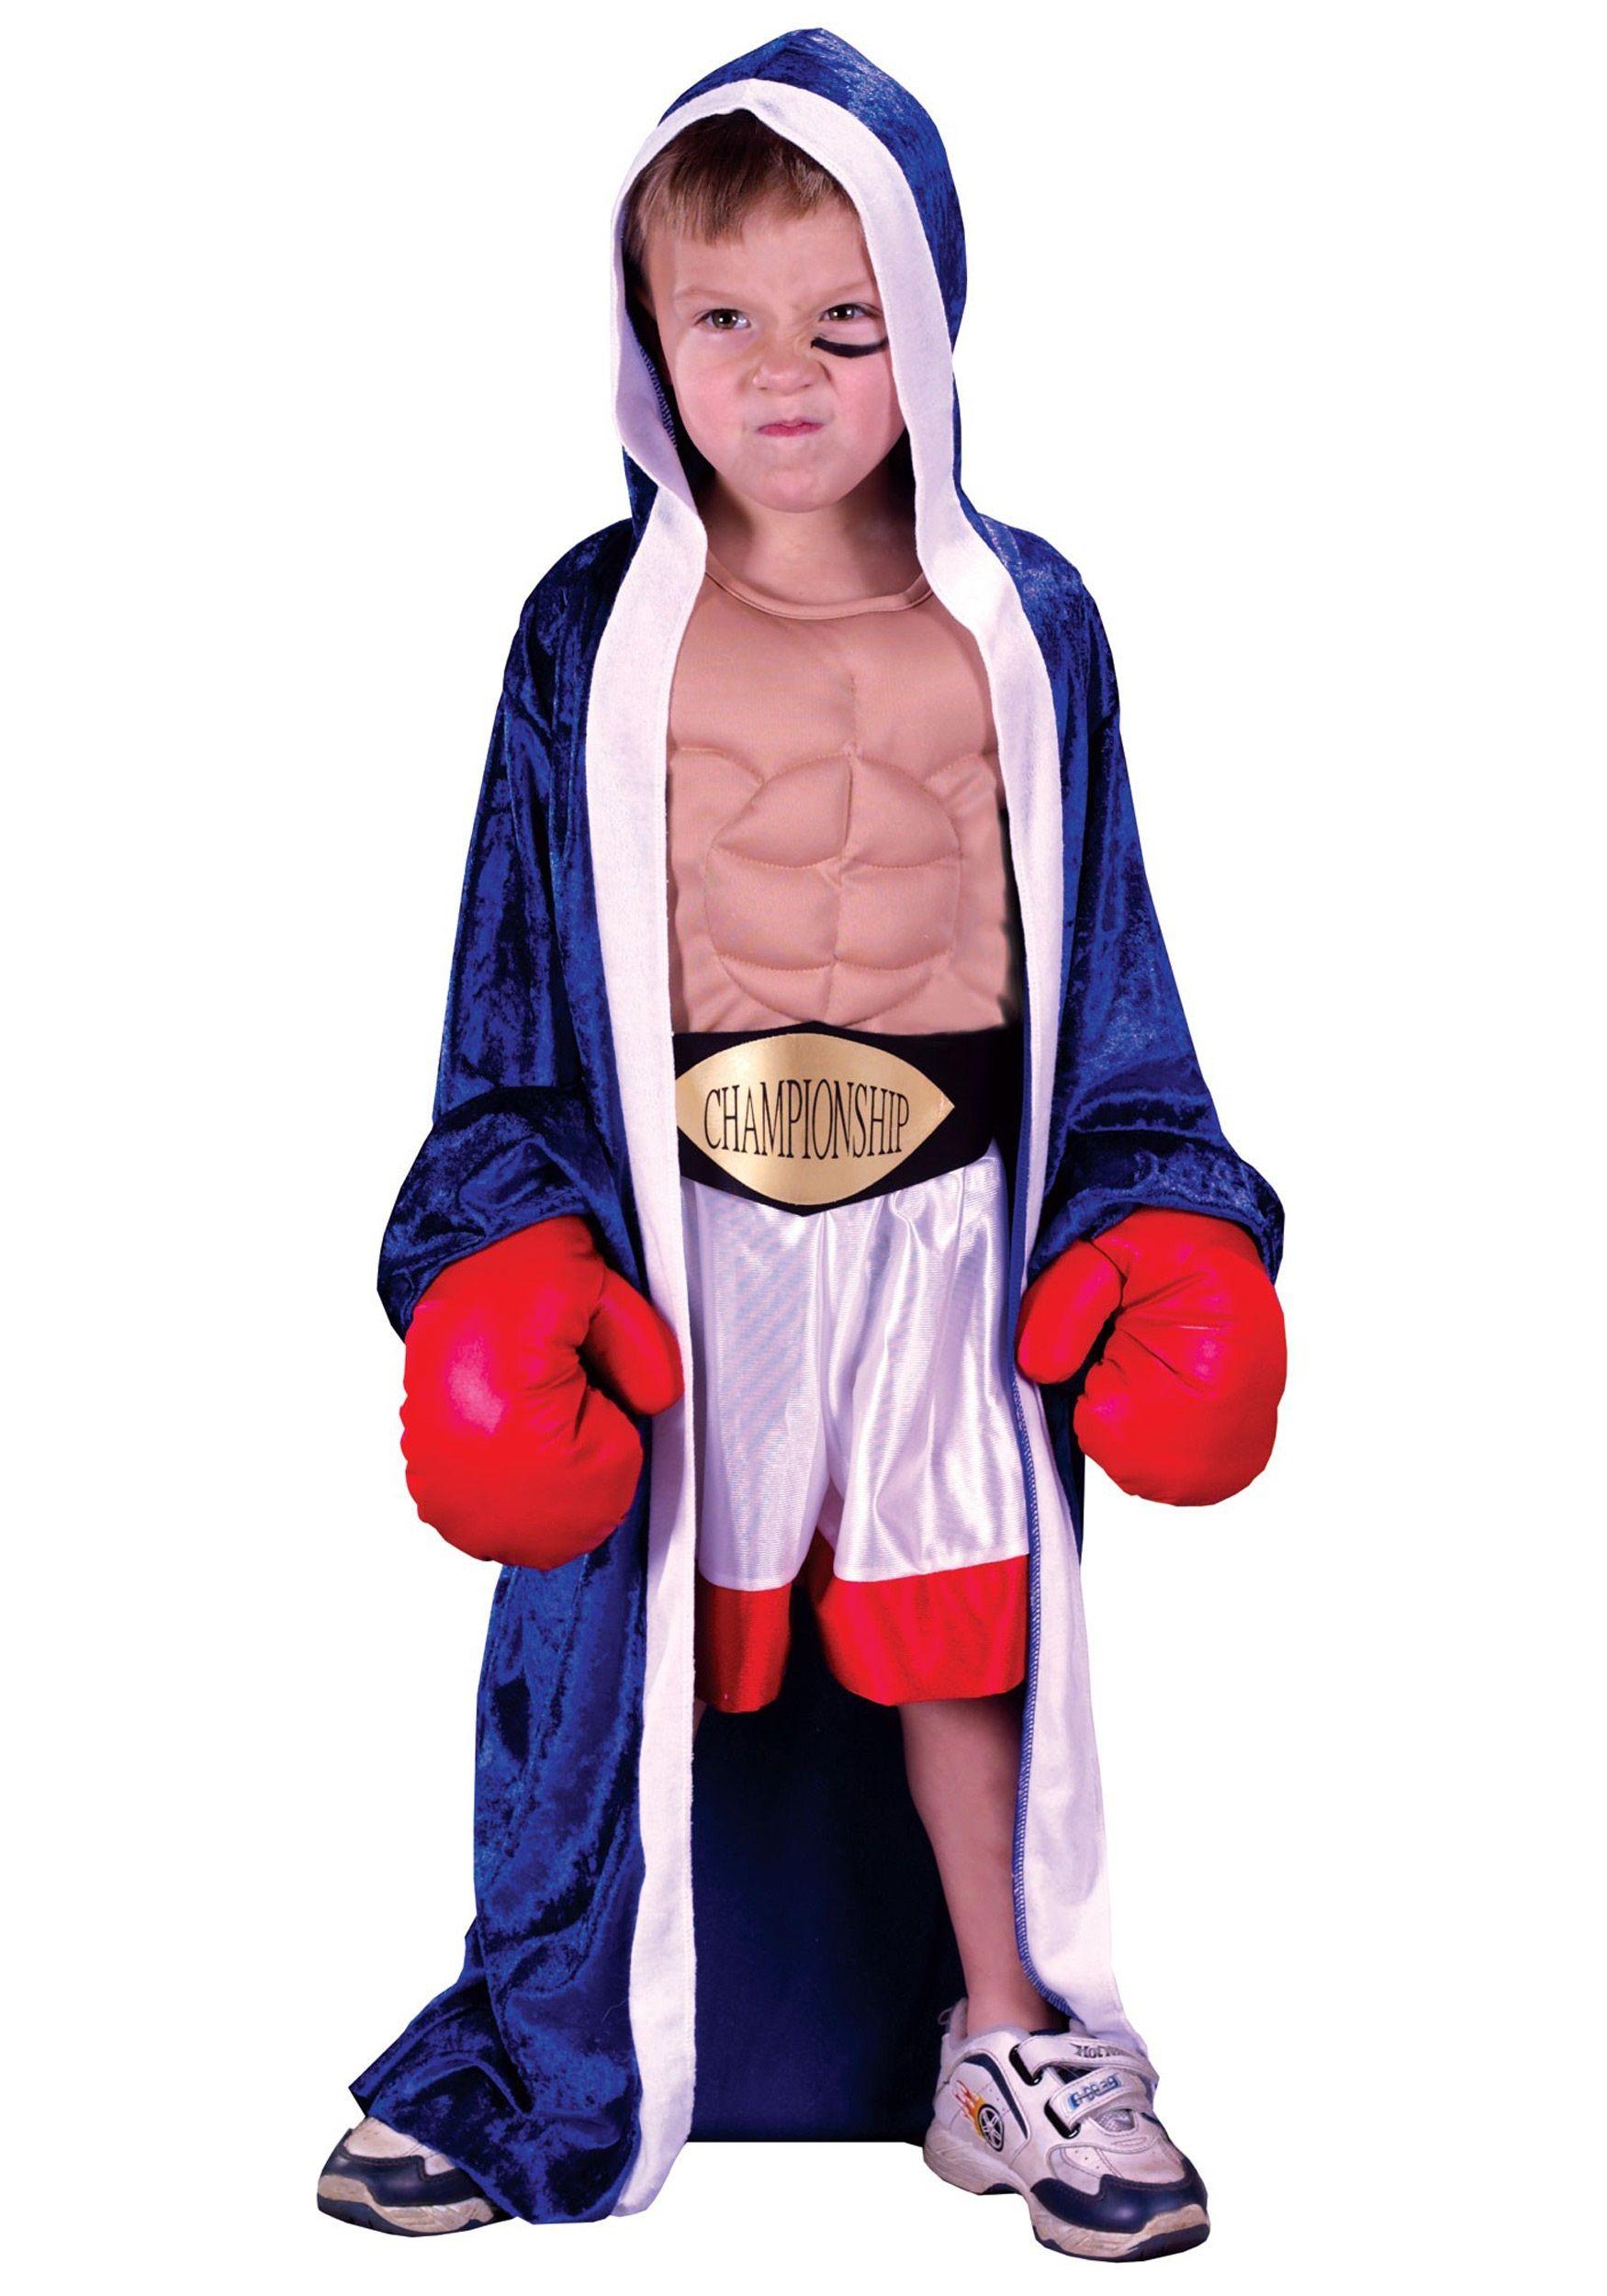 Toddler Boxer Costume   Baby Halloween Costumes   Pinterest ...